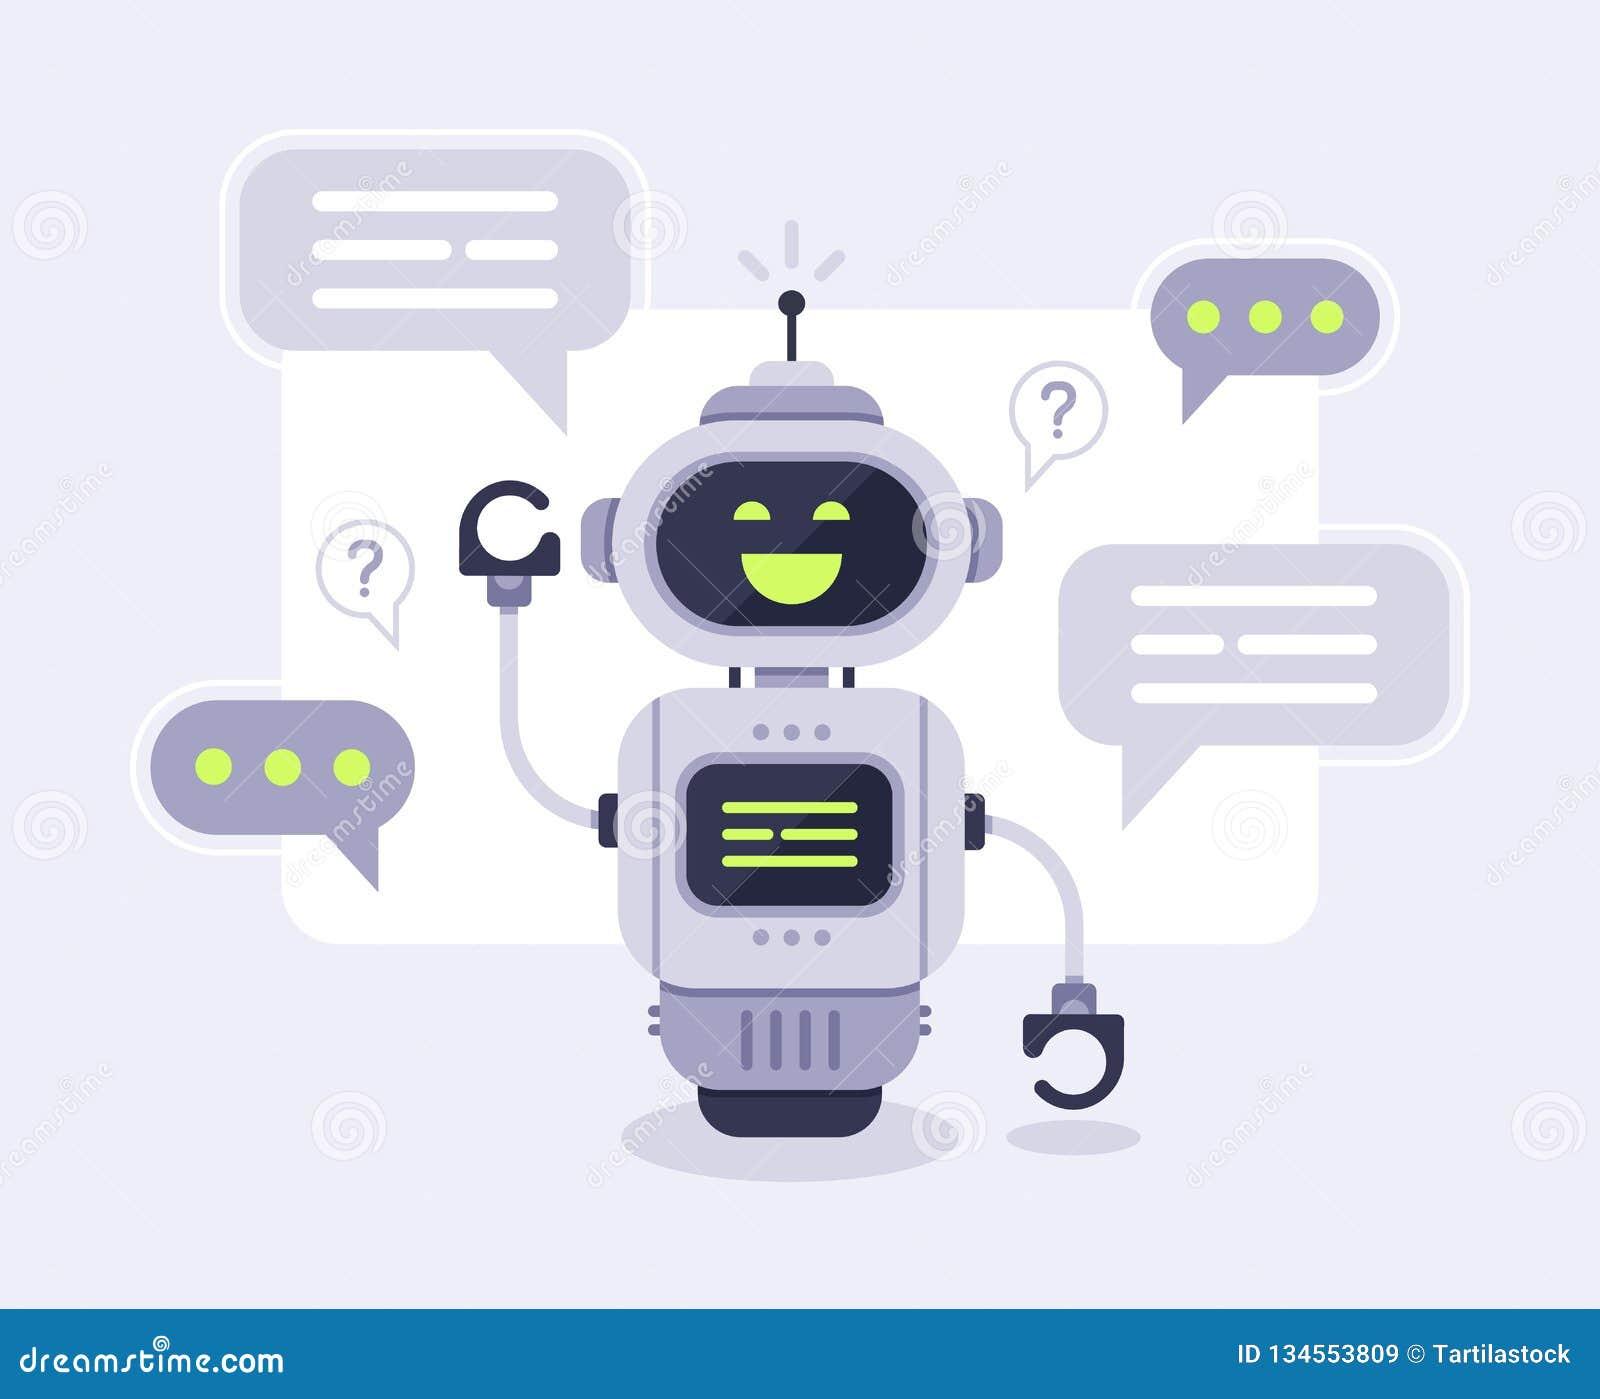 talk to a robot online free